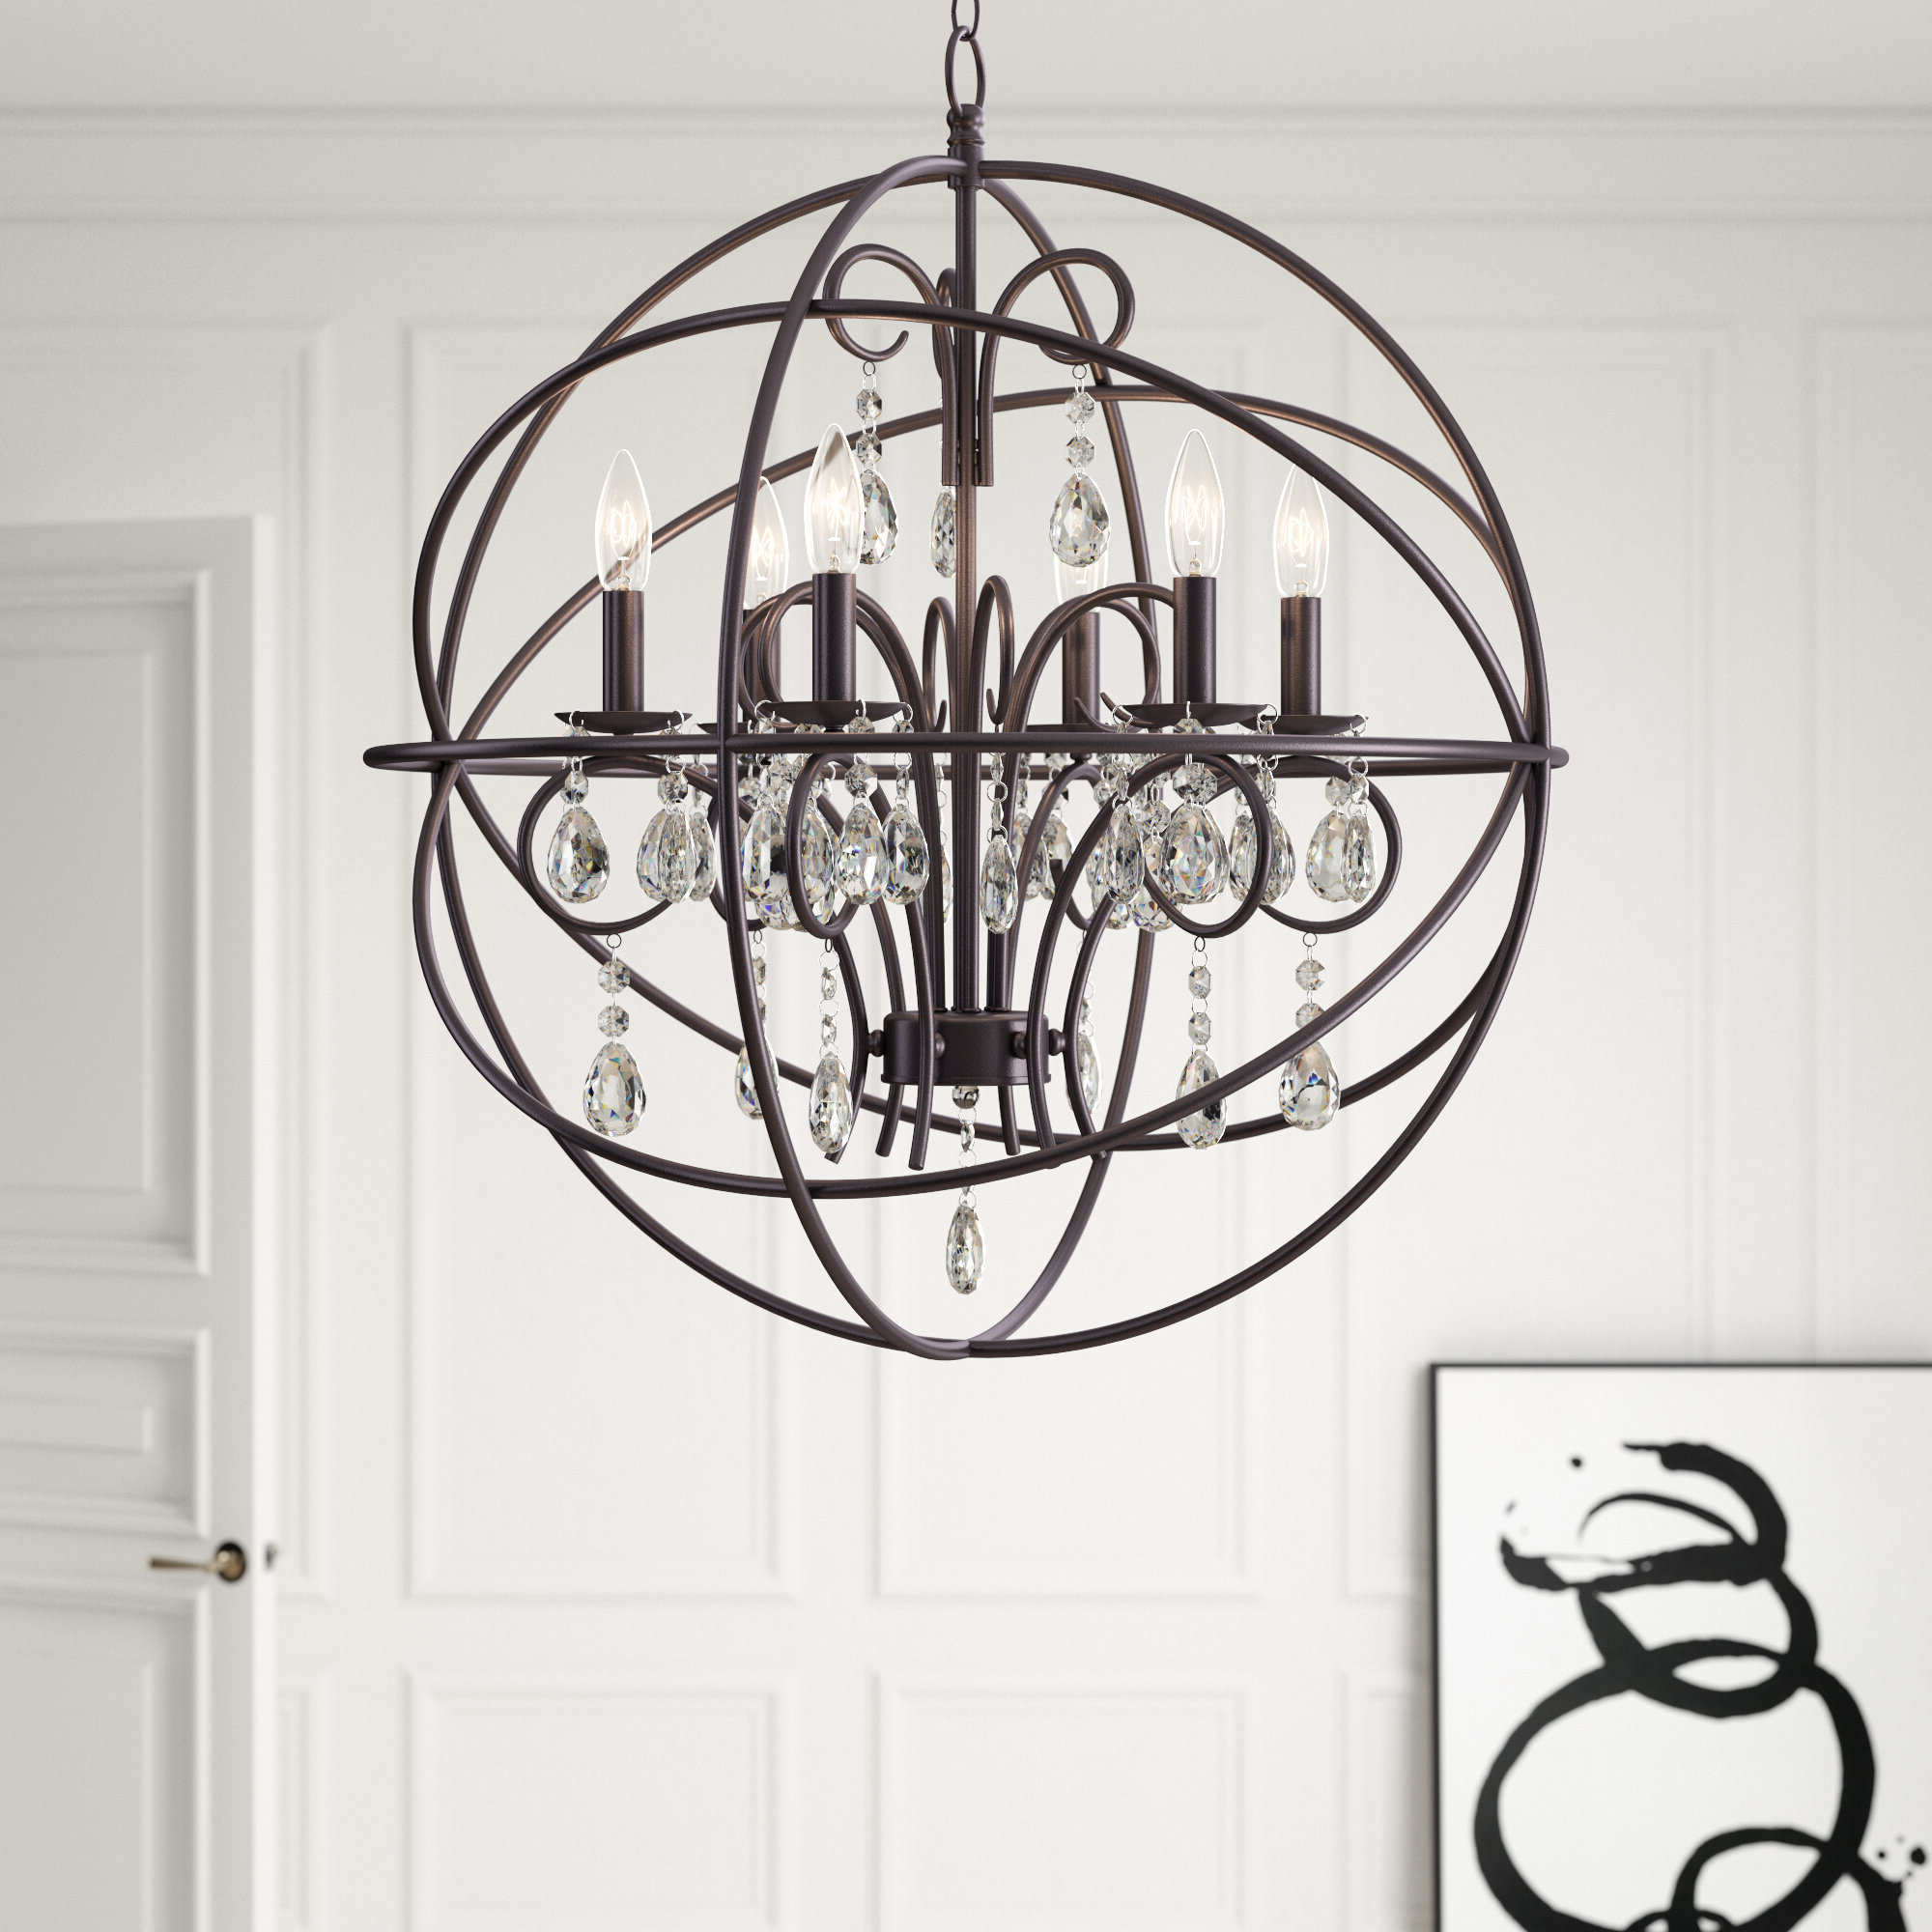 Eastbourne 6-Light Unique / Statement Chandeliers pertaining to Preferred Alden 6-Light Globe Chandelier